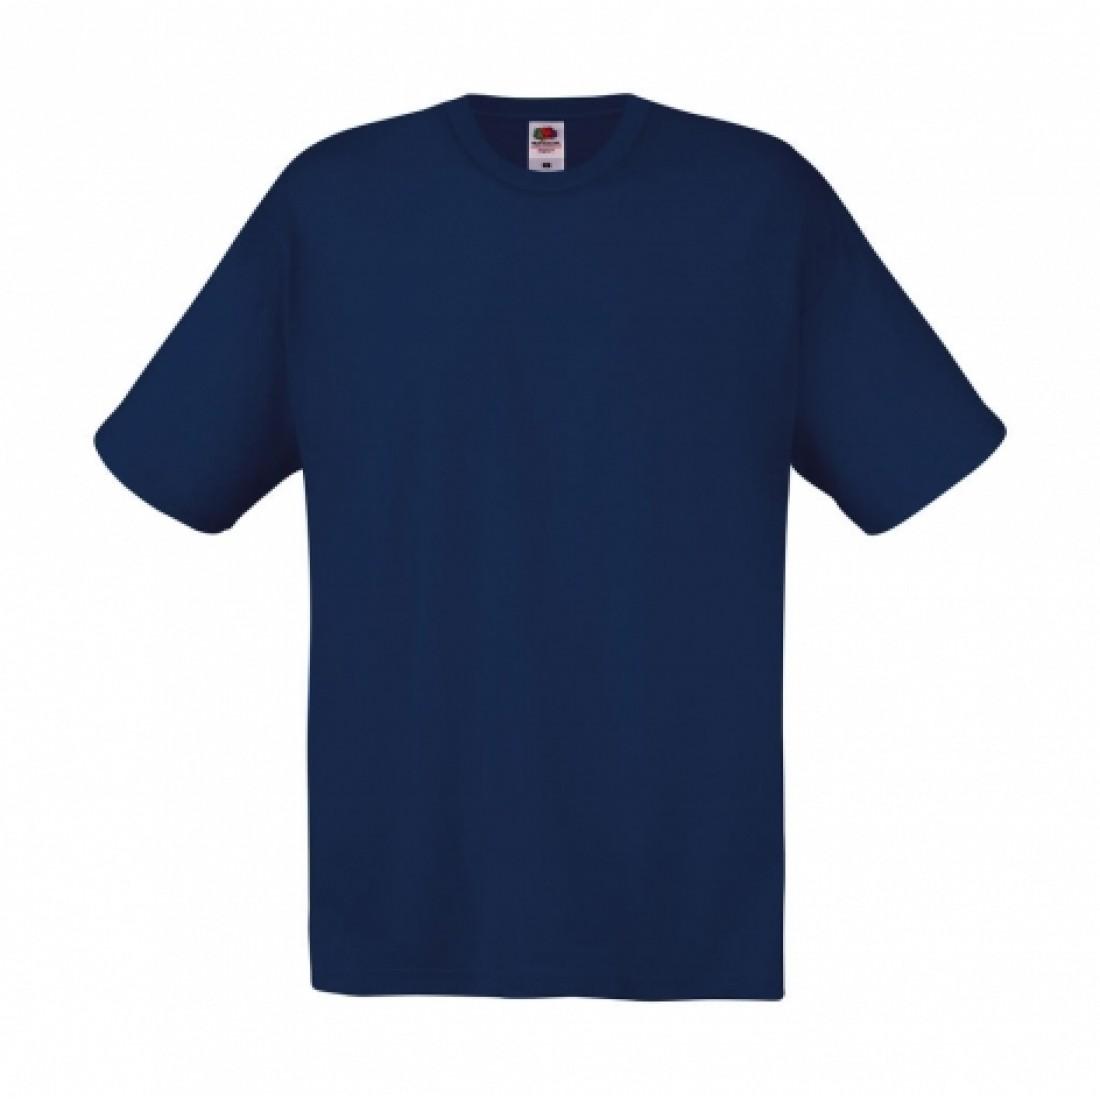 a34572ebb319 Ενδυση Εργασιας - Ανδρικό Μπλουζάκι Fruit of the Loom